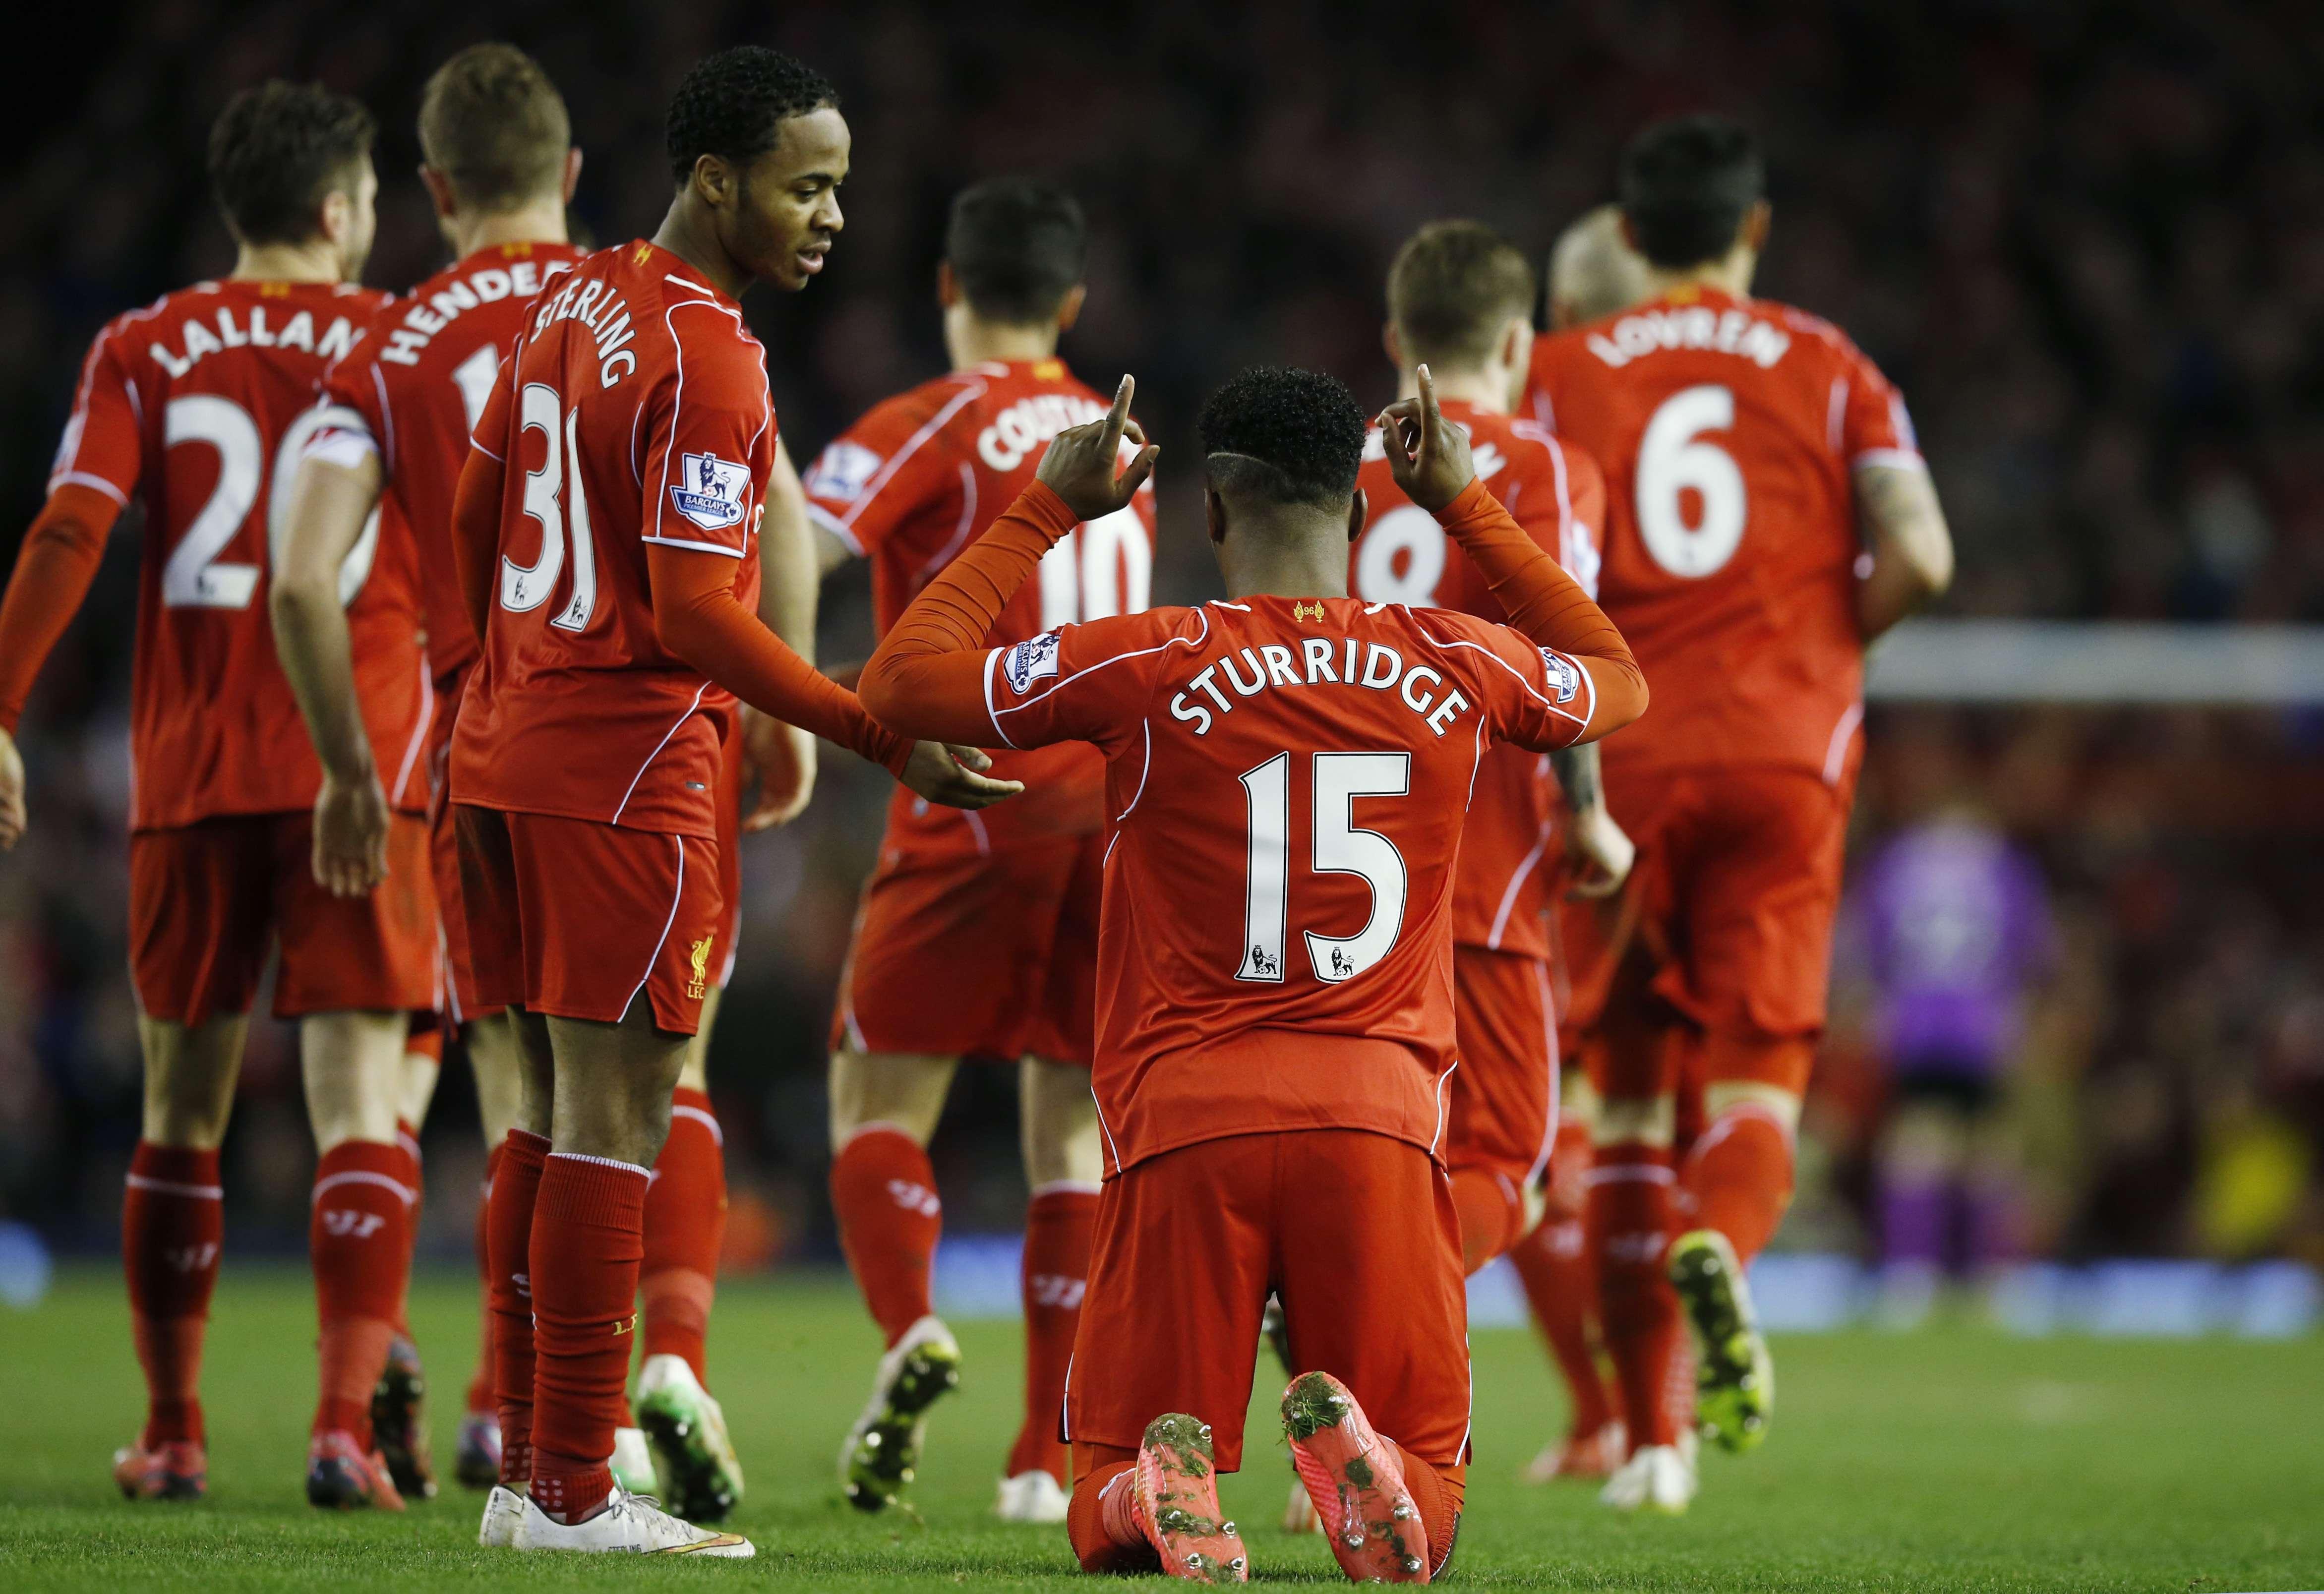 Sturridge hizo el segundo y definitivo gol. Foto: Reuters